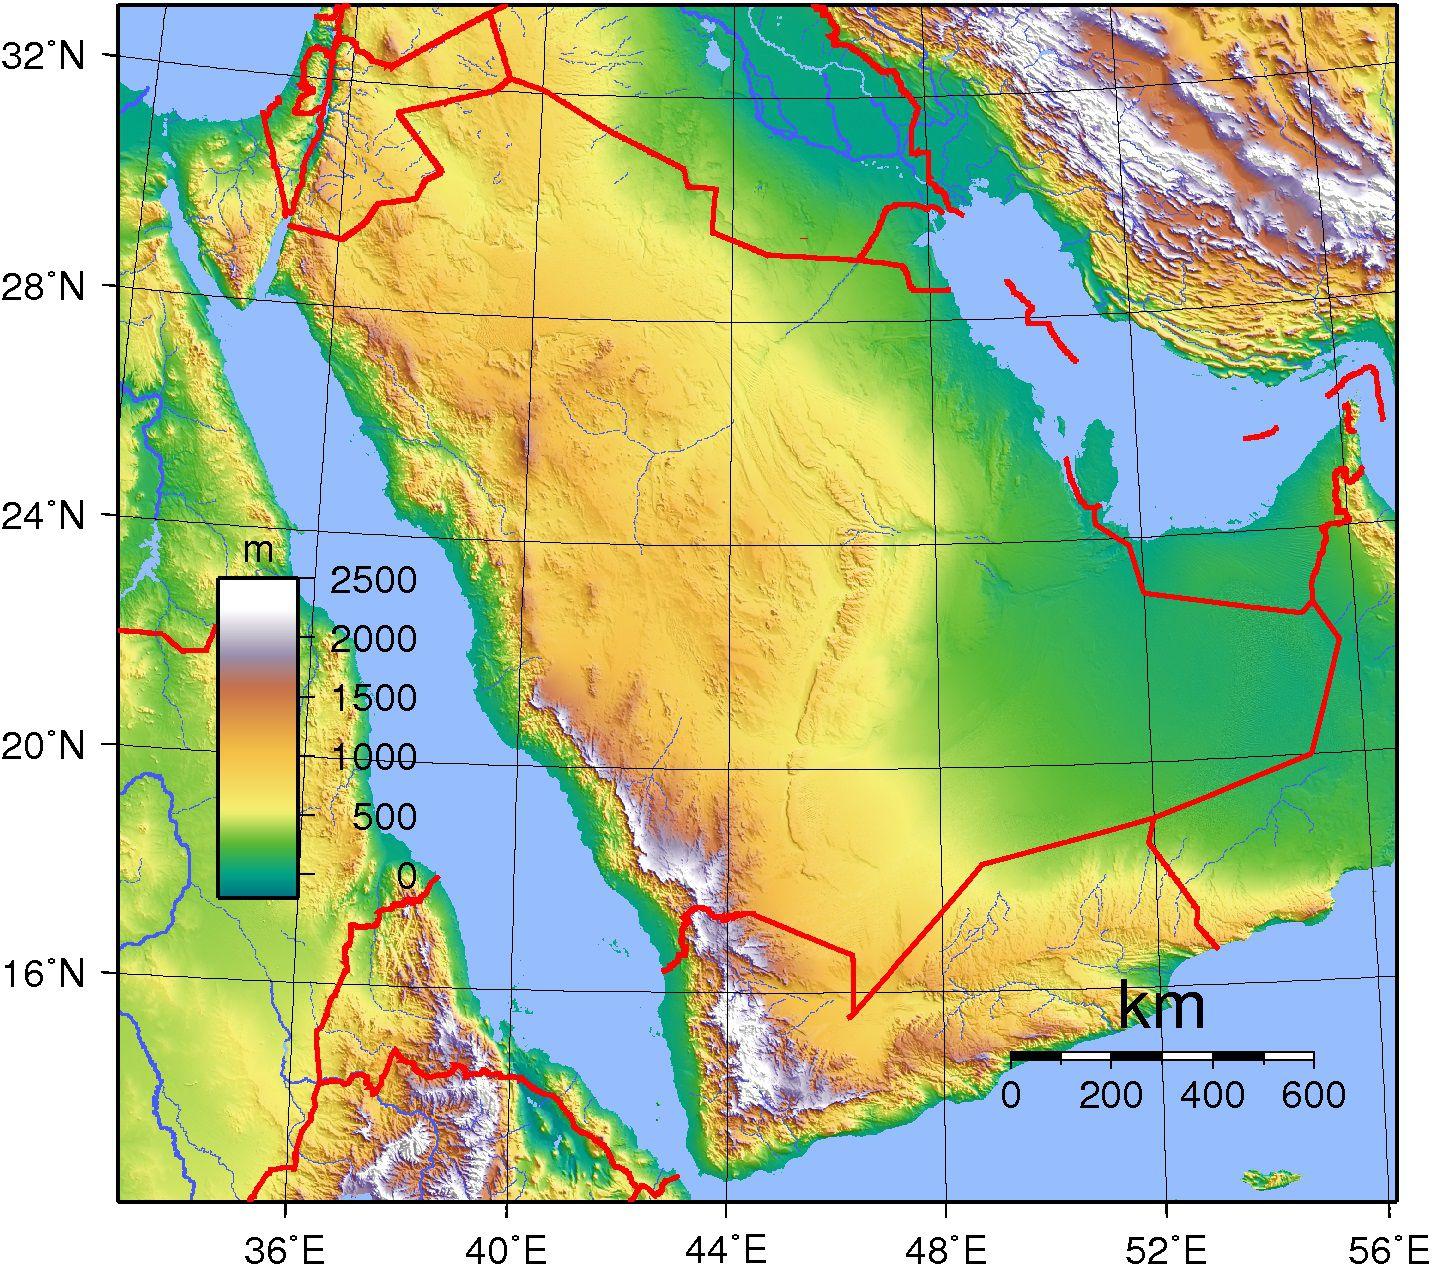 Carte du relief de l'Arabie Saoudite